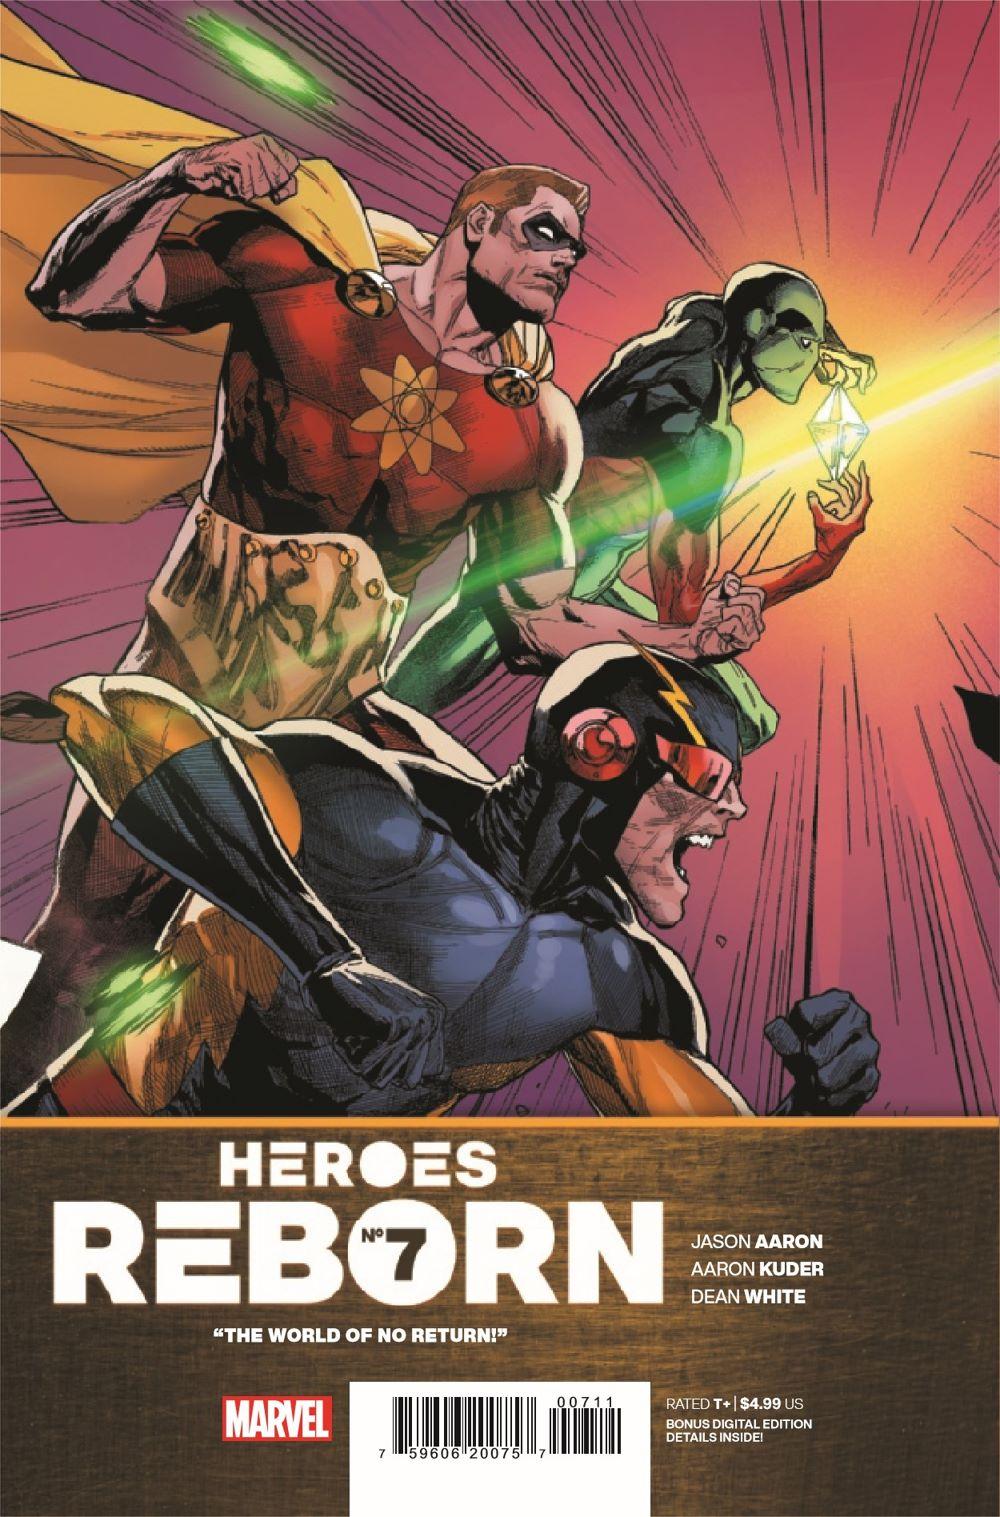 HEROESREBORN2021007_Preview-1 ComicList Previews: HEROES REBORN #7 (OF 7)